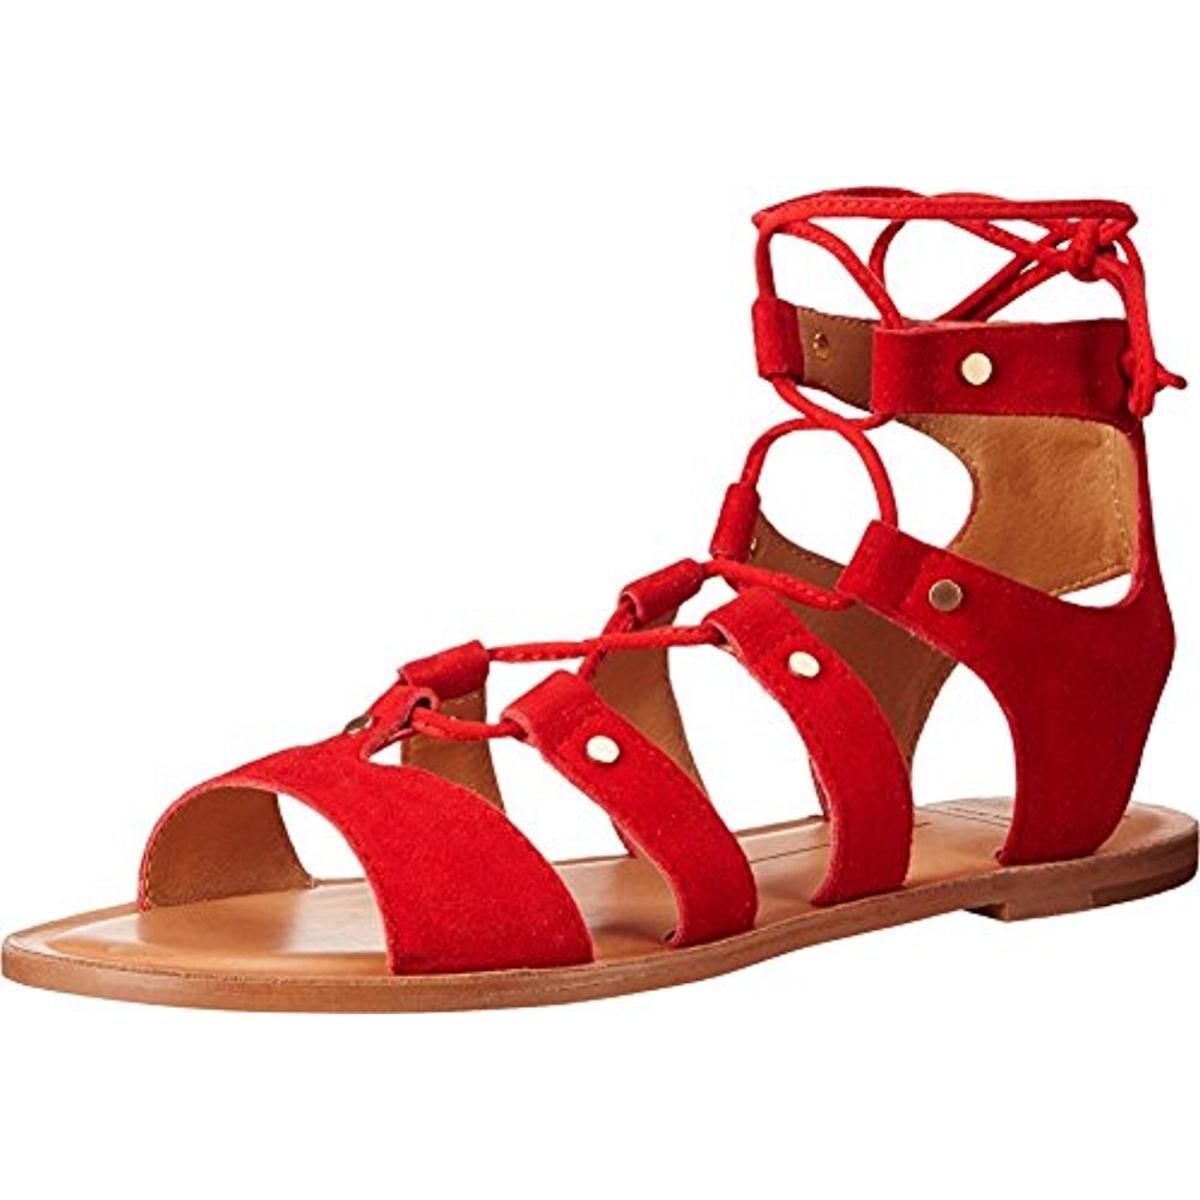 Dolce Vita Womens Jasmyn Gladiator Sandal